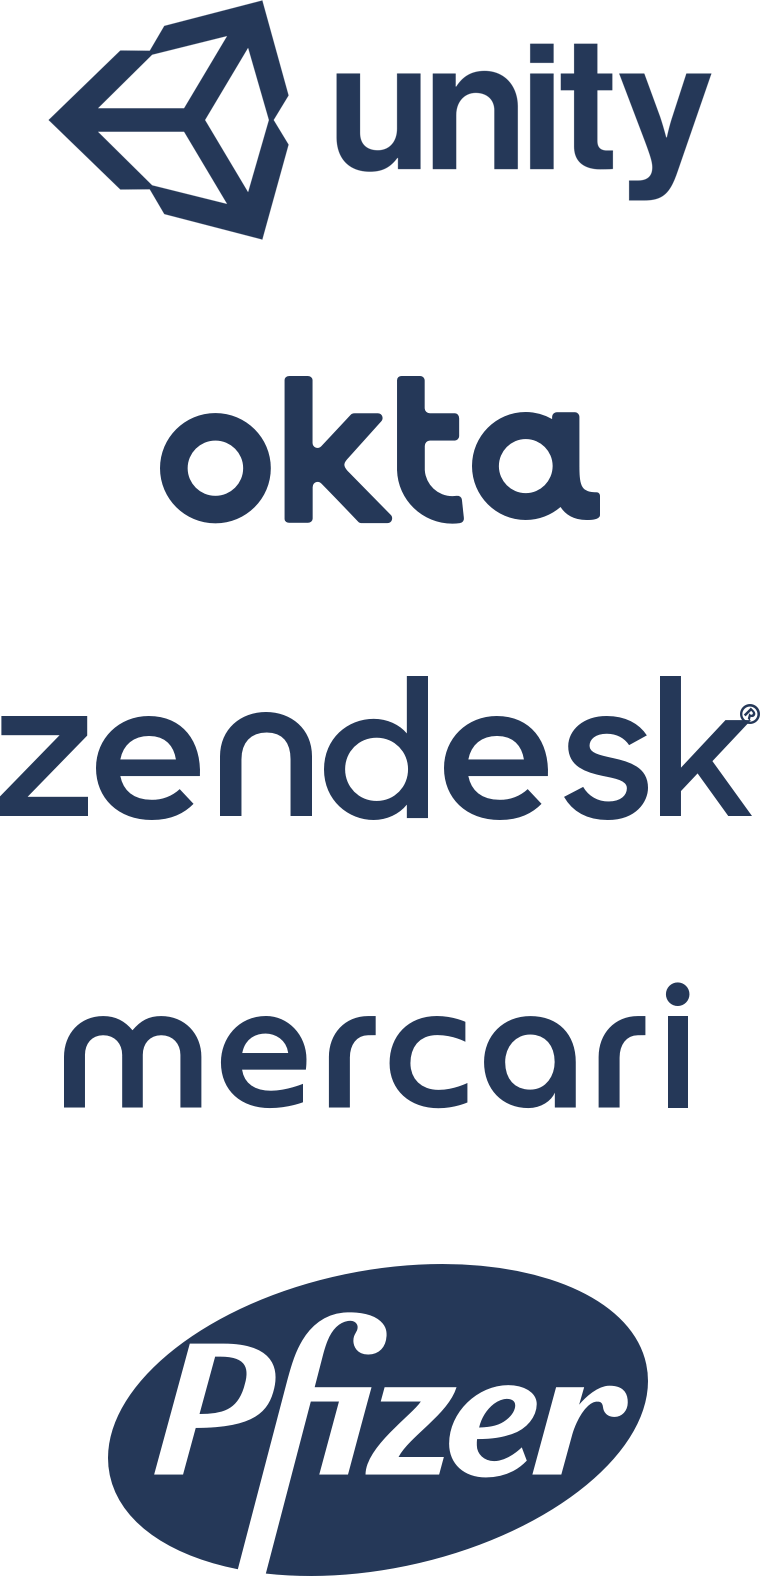 Logos: Unity, Okta, Zendesk, Mercari, Pfizer